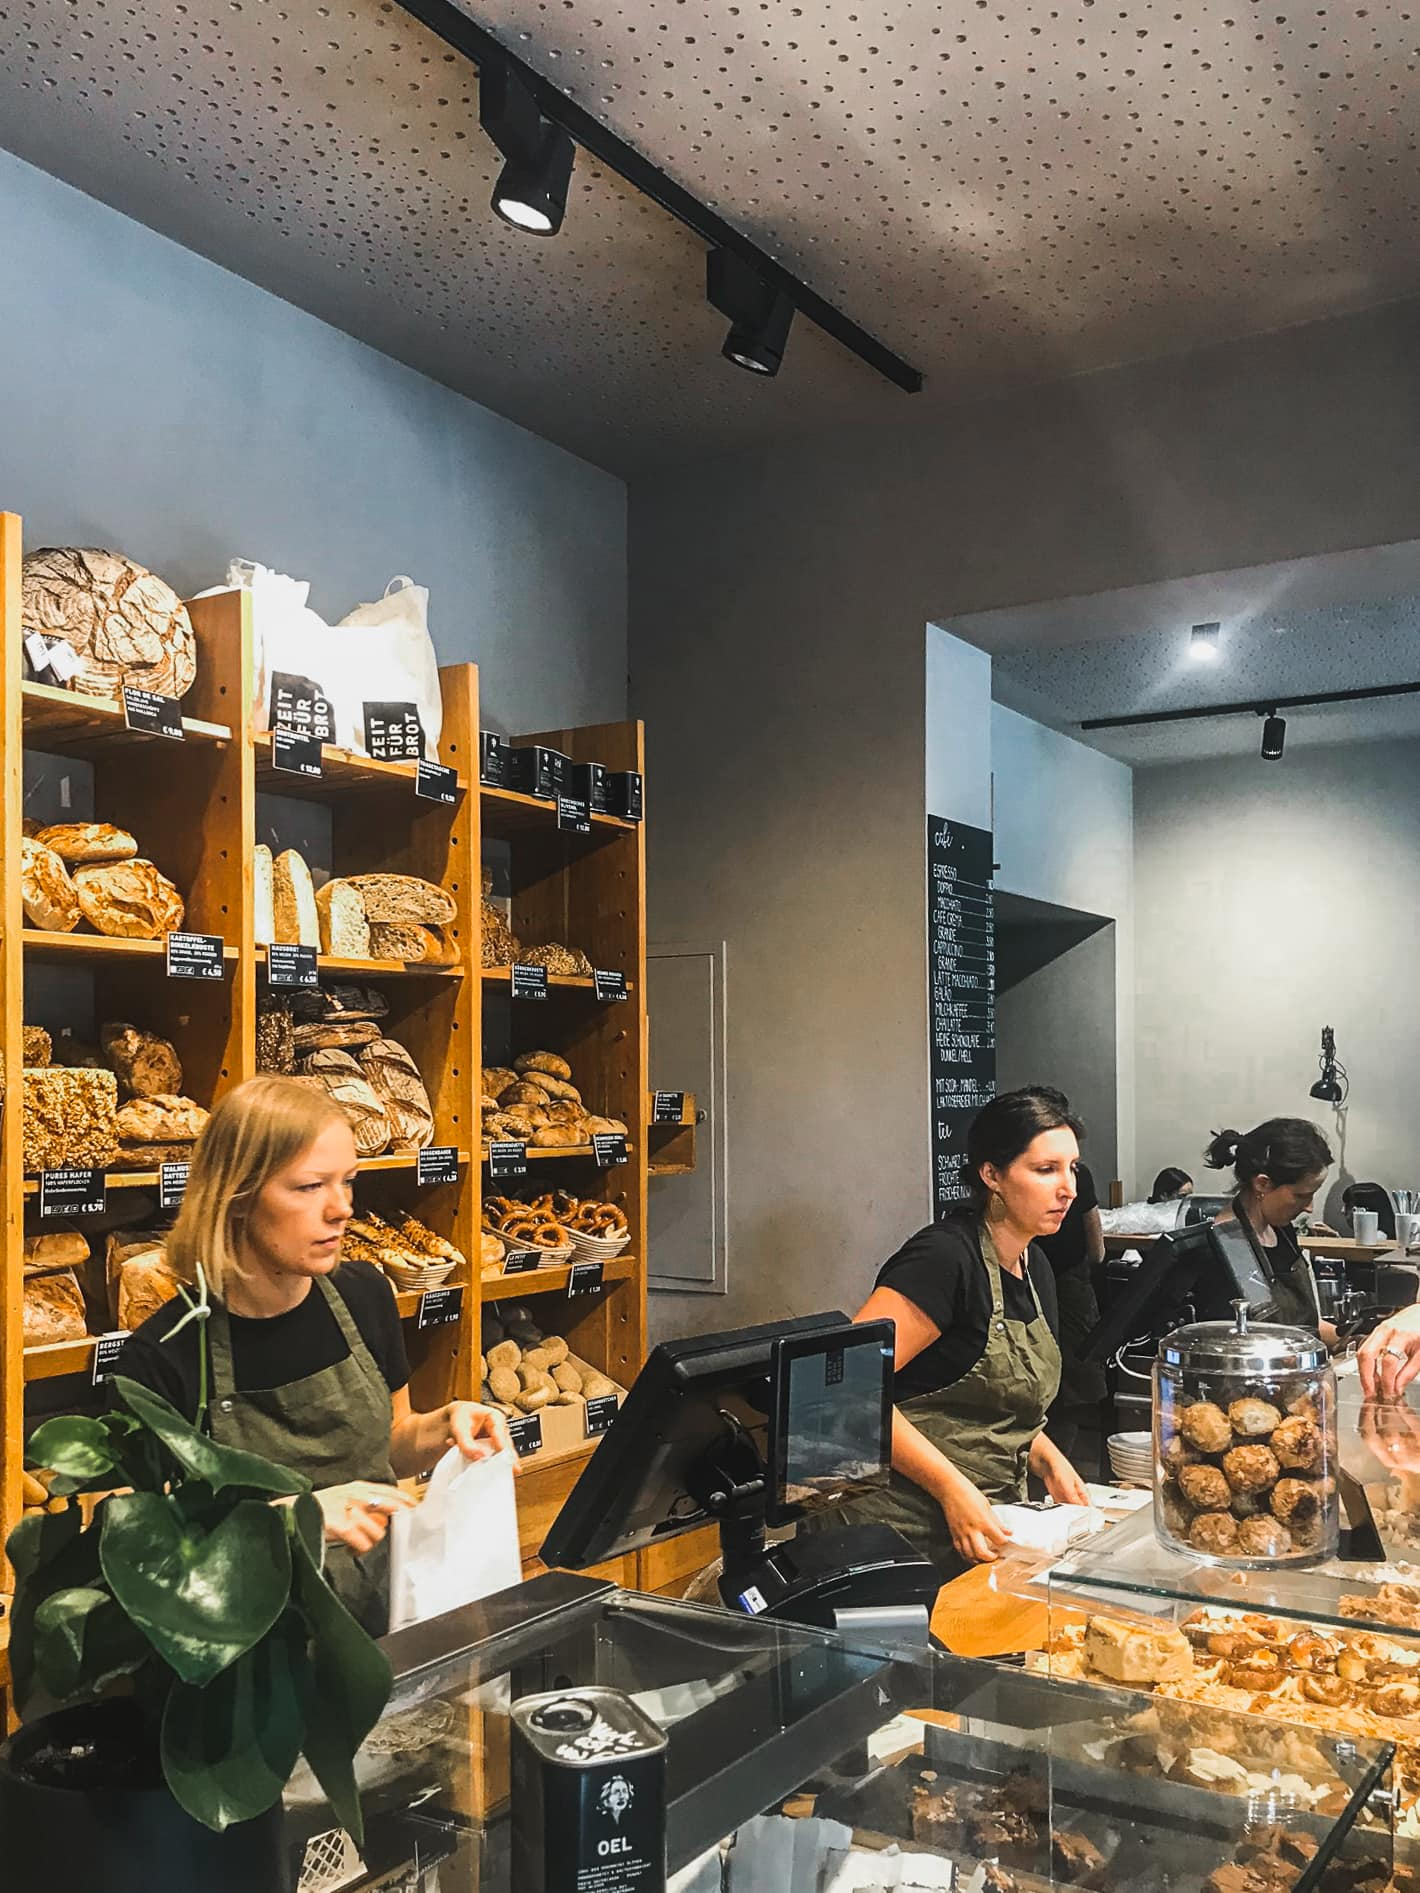 If you love cinnamon rolls, Zeit Für Brot is the best place to eat in Berlin